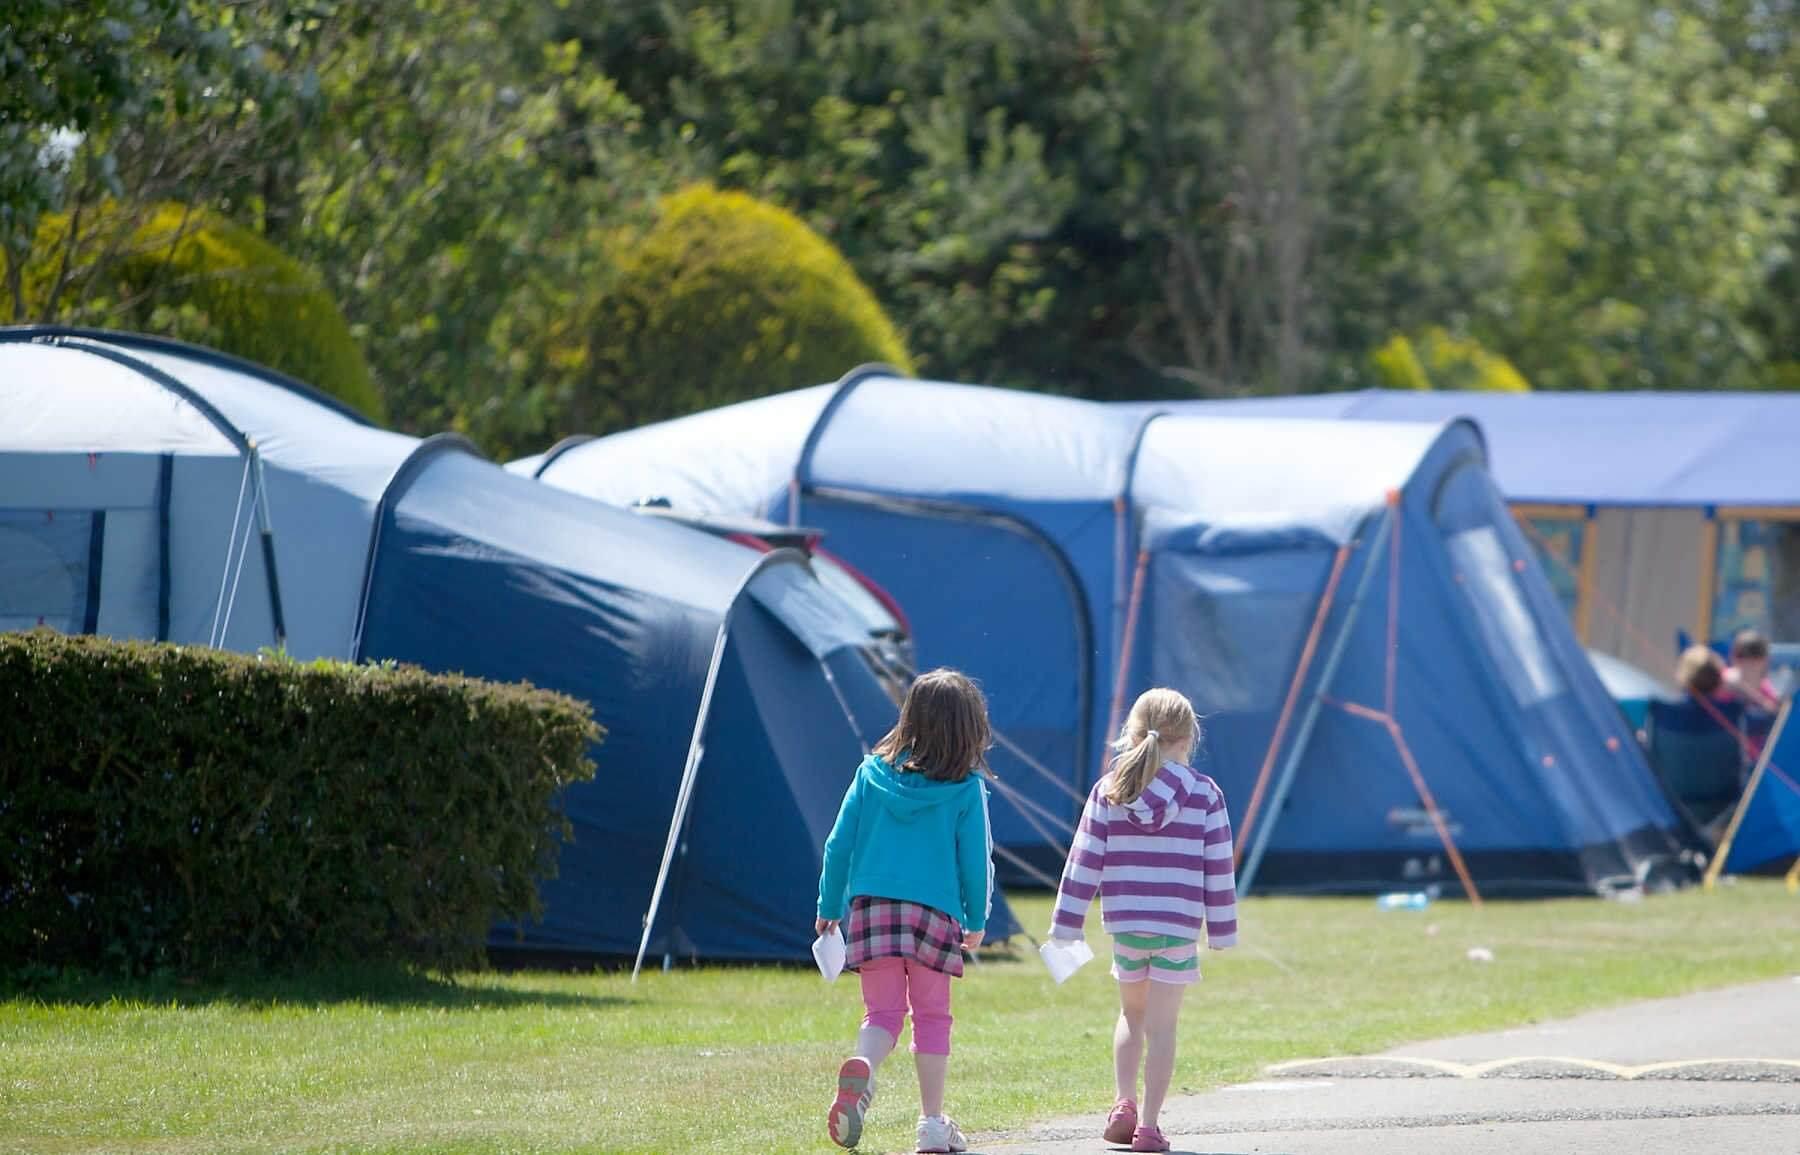 Merley Court Holiday Park (shorefield Holidays)